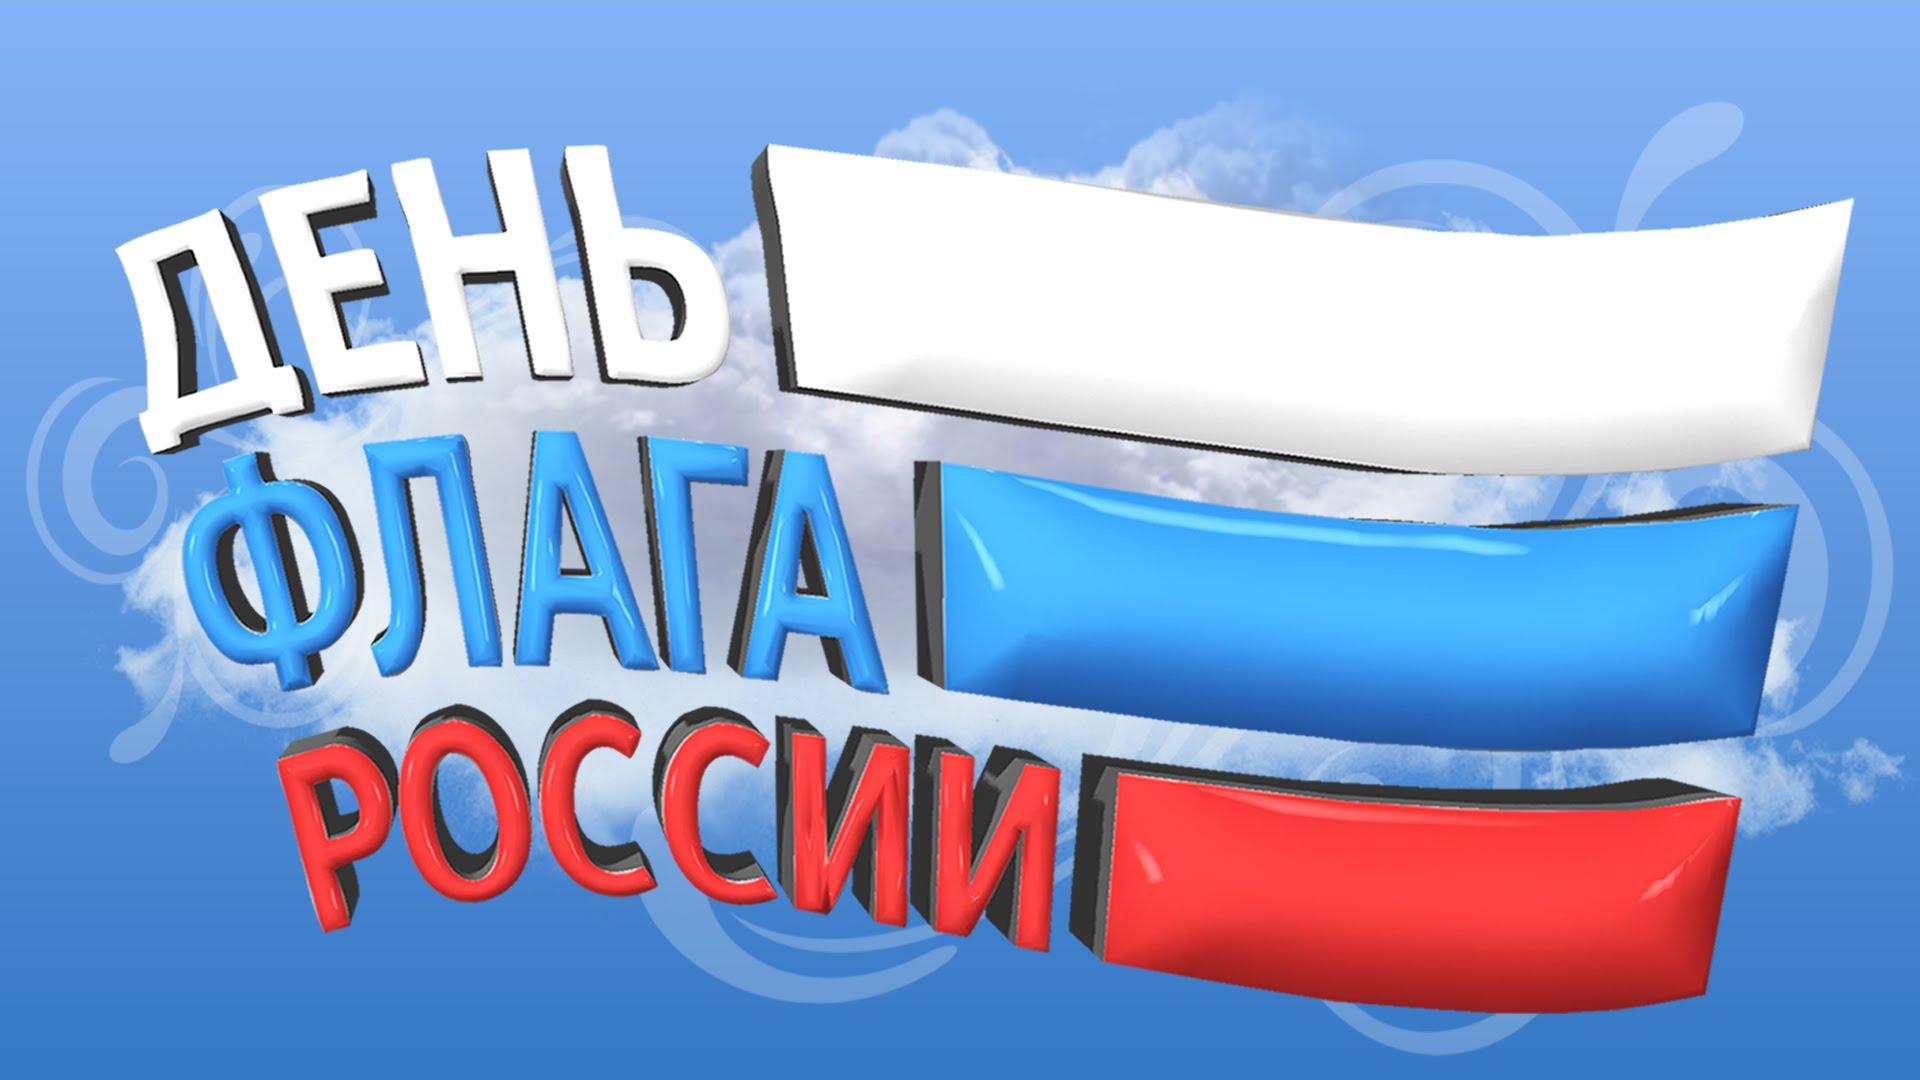 Тебя любит, картинки ко дню флага россии